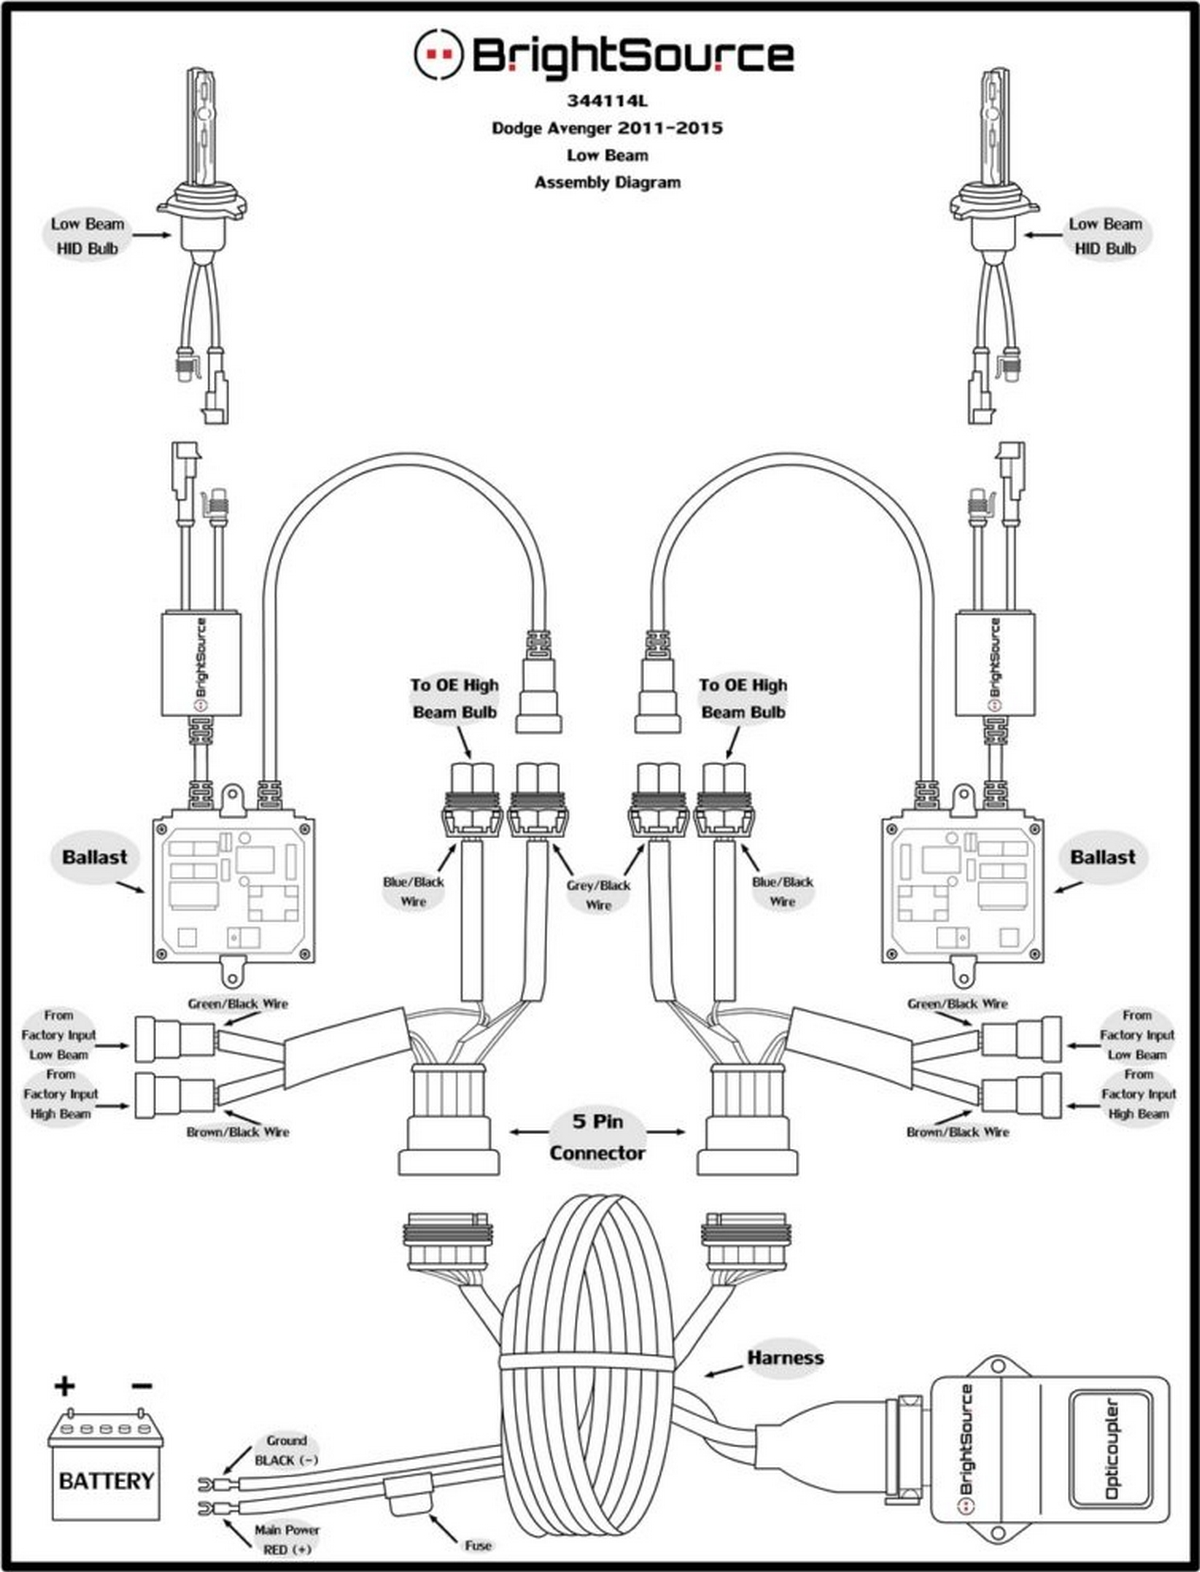 install diagrams